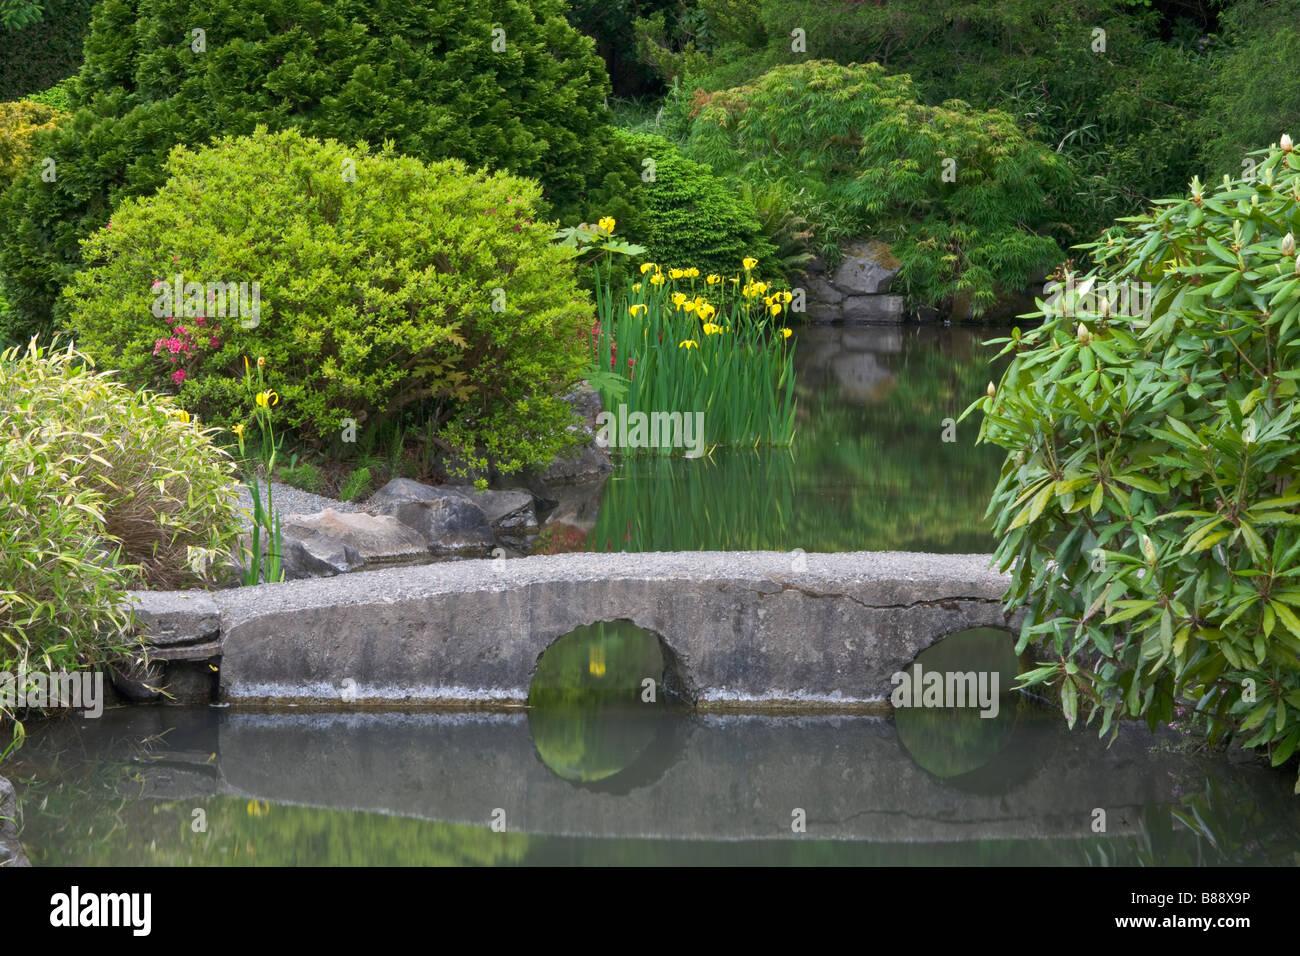 Seattle WA Kubota Garden City Park A Stone Bridge Spans Pond In The Japanese